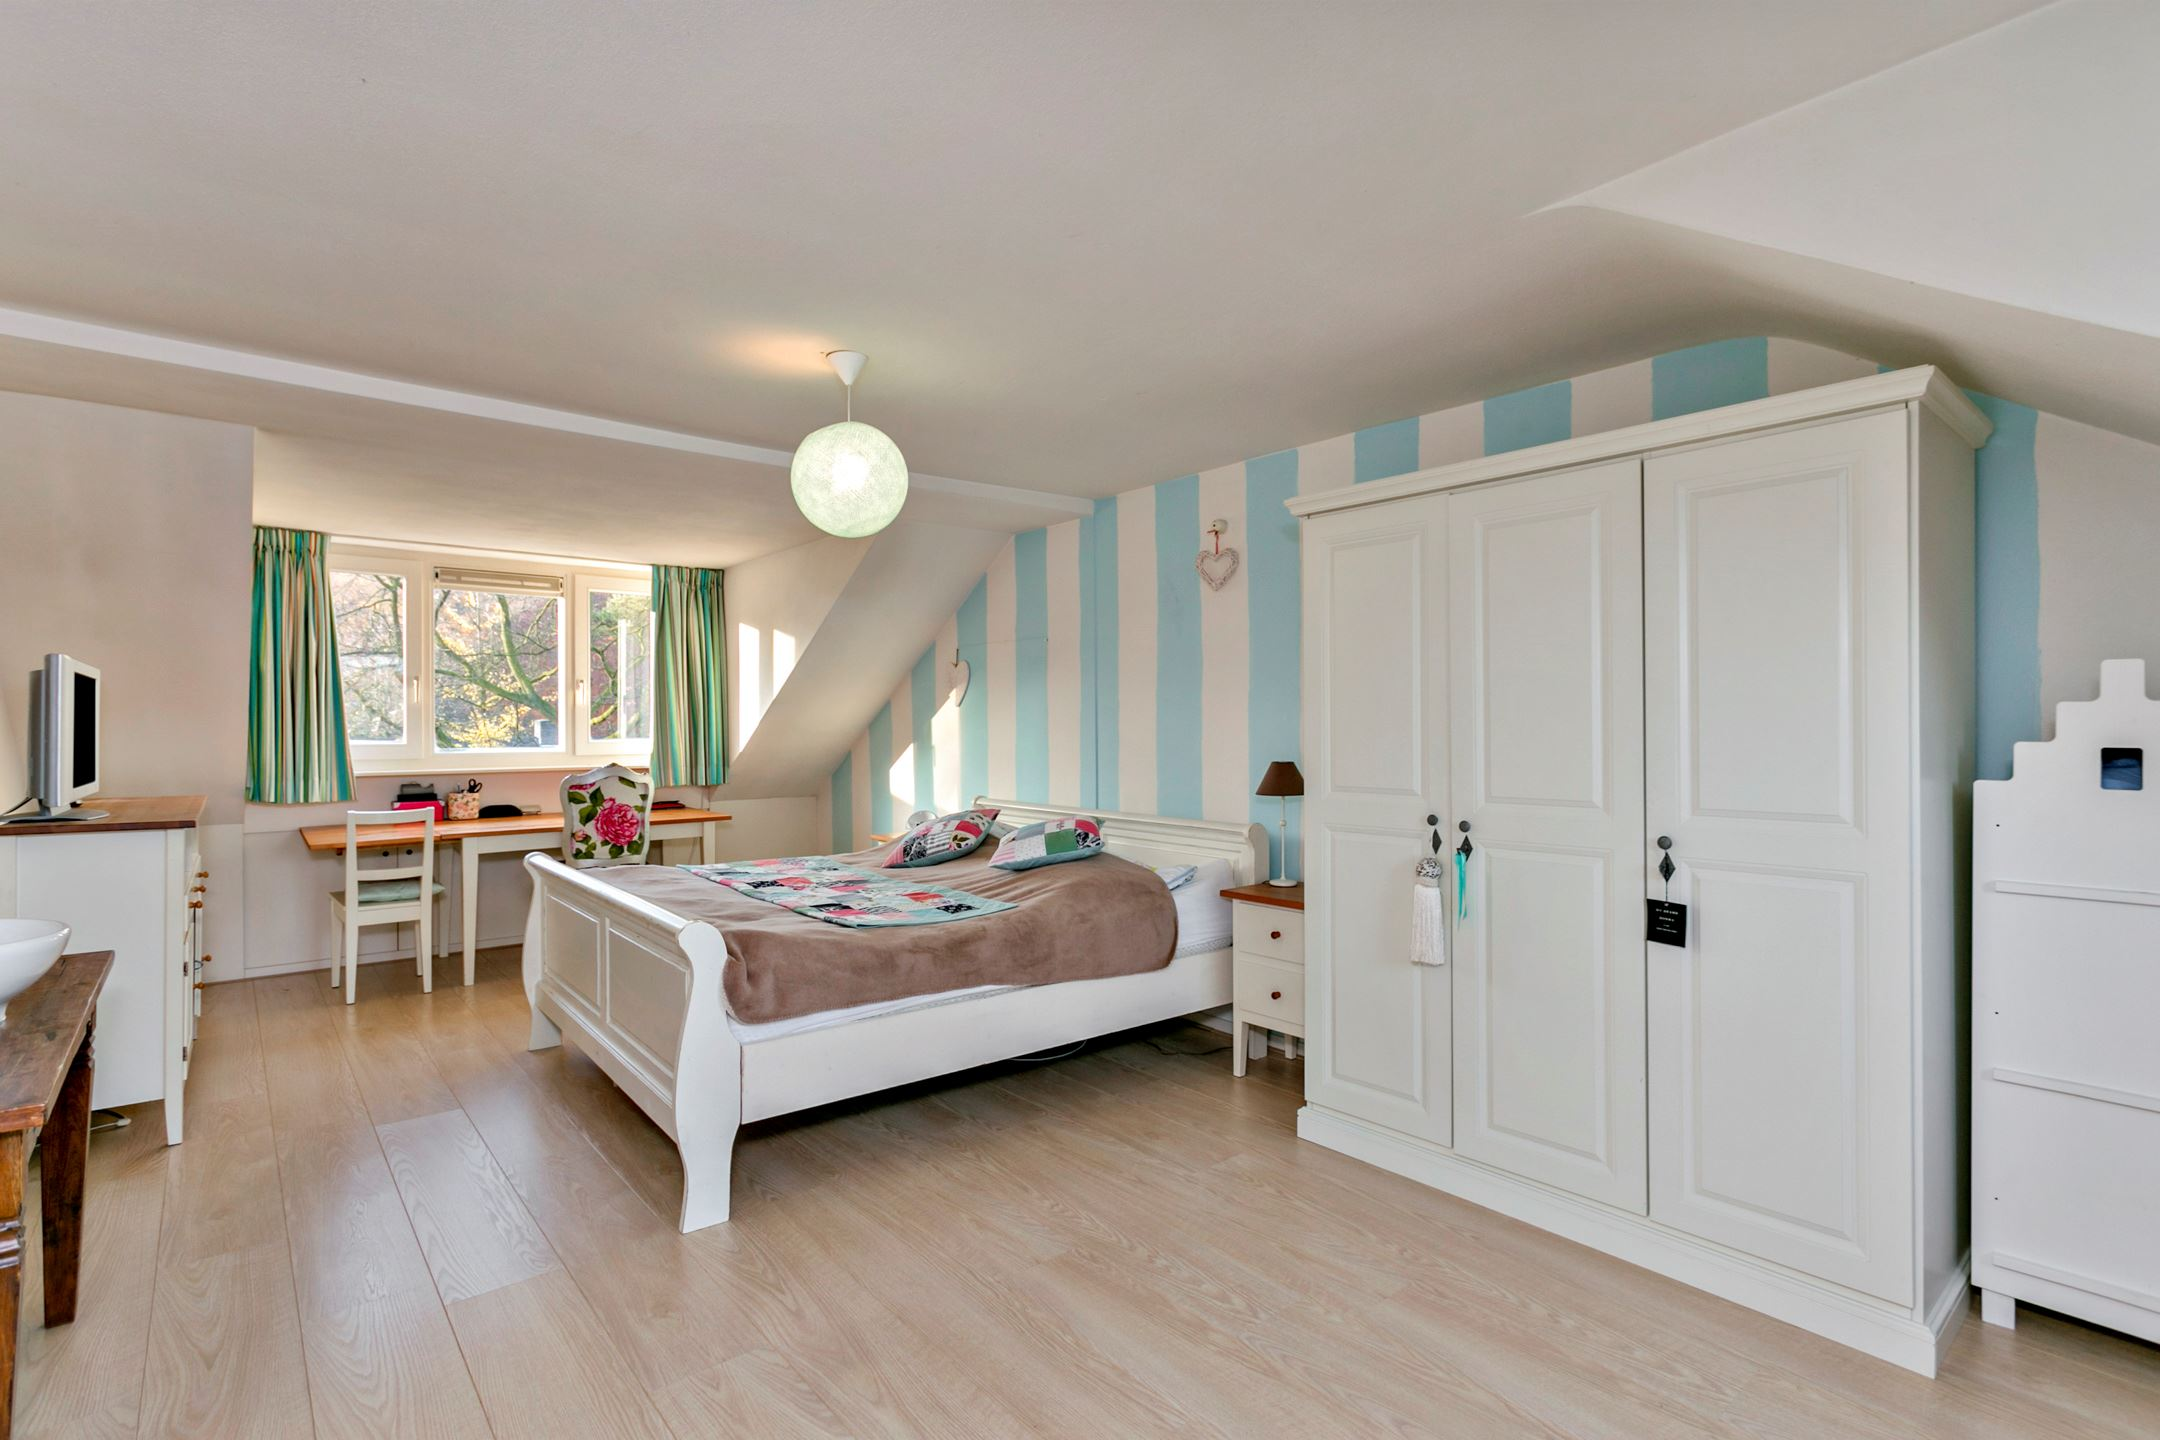 House For Sale Vesaliuslaan 40 5644 Hl Eindhoven Funda